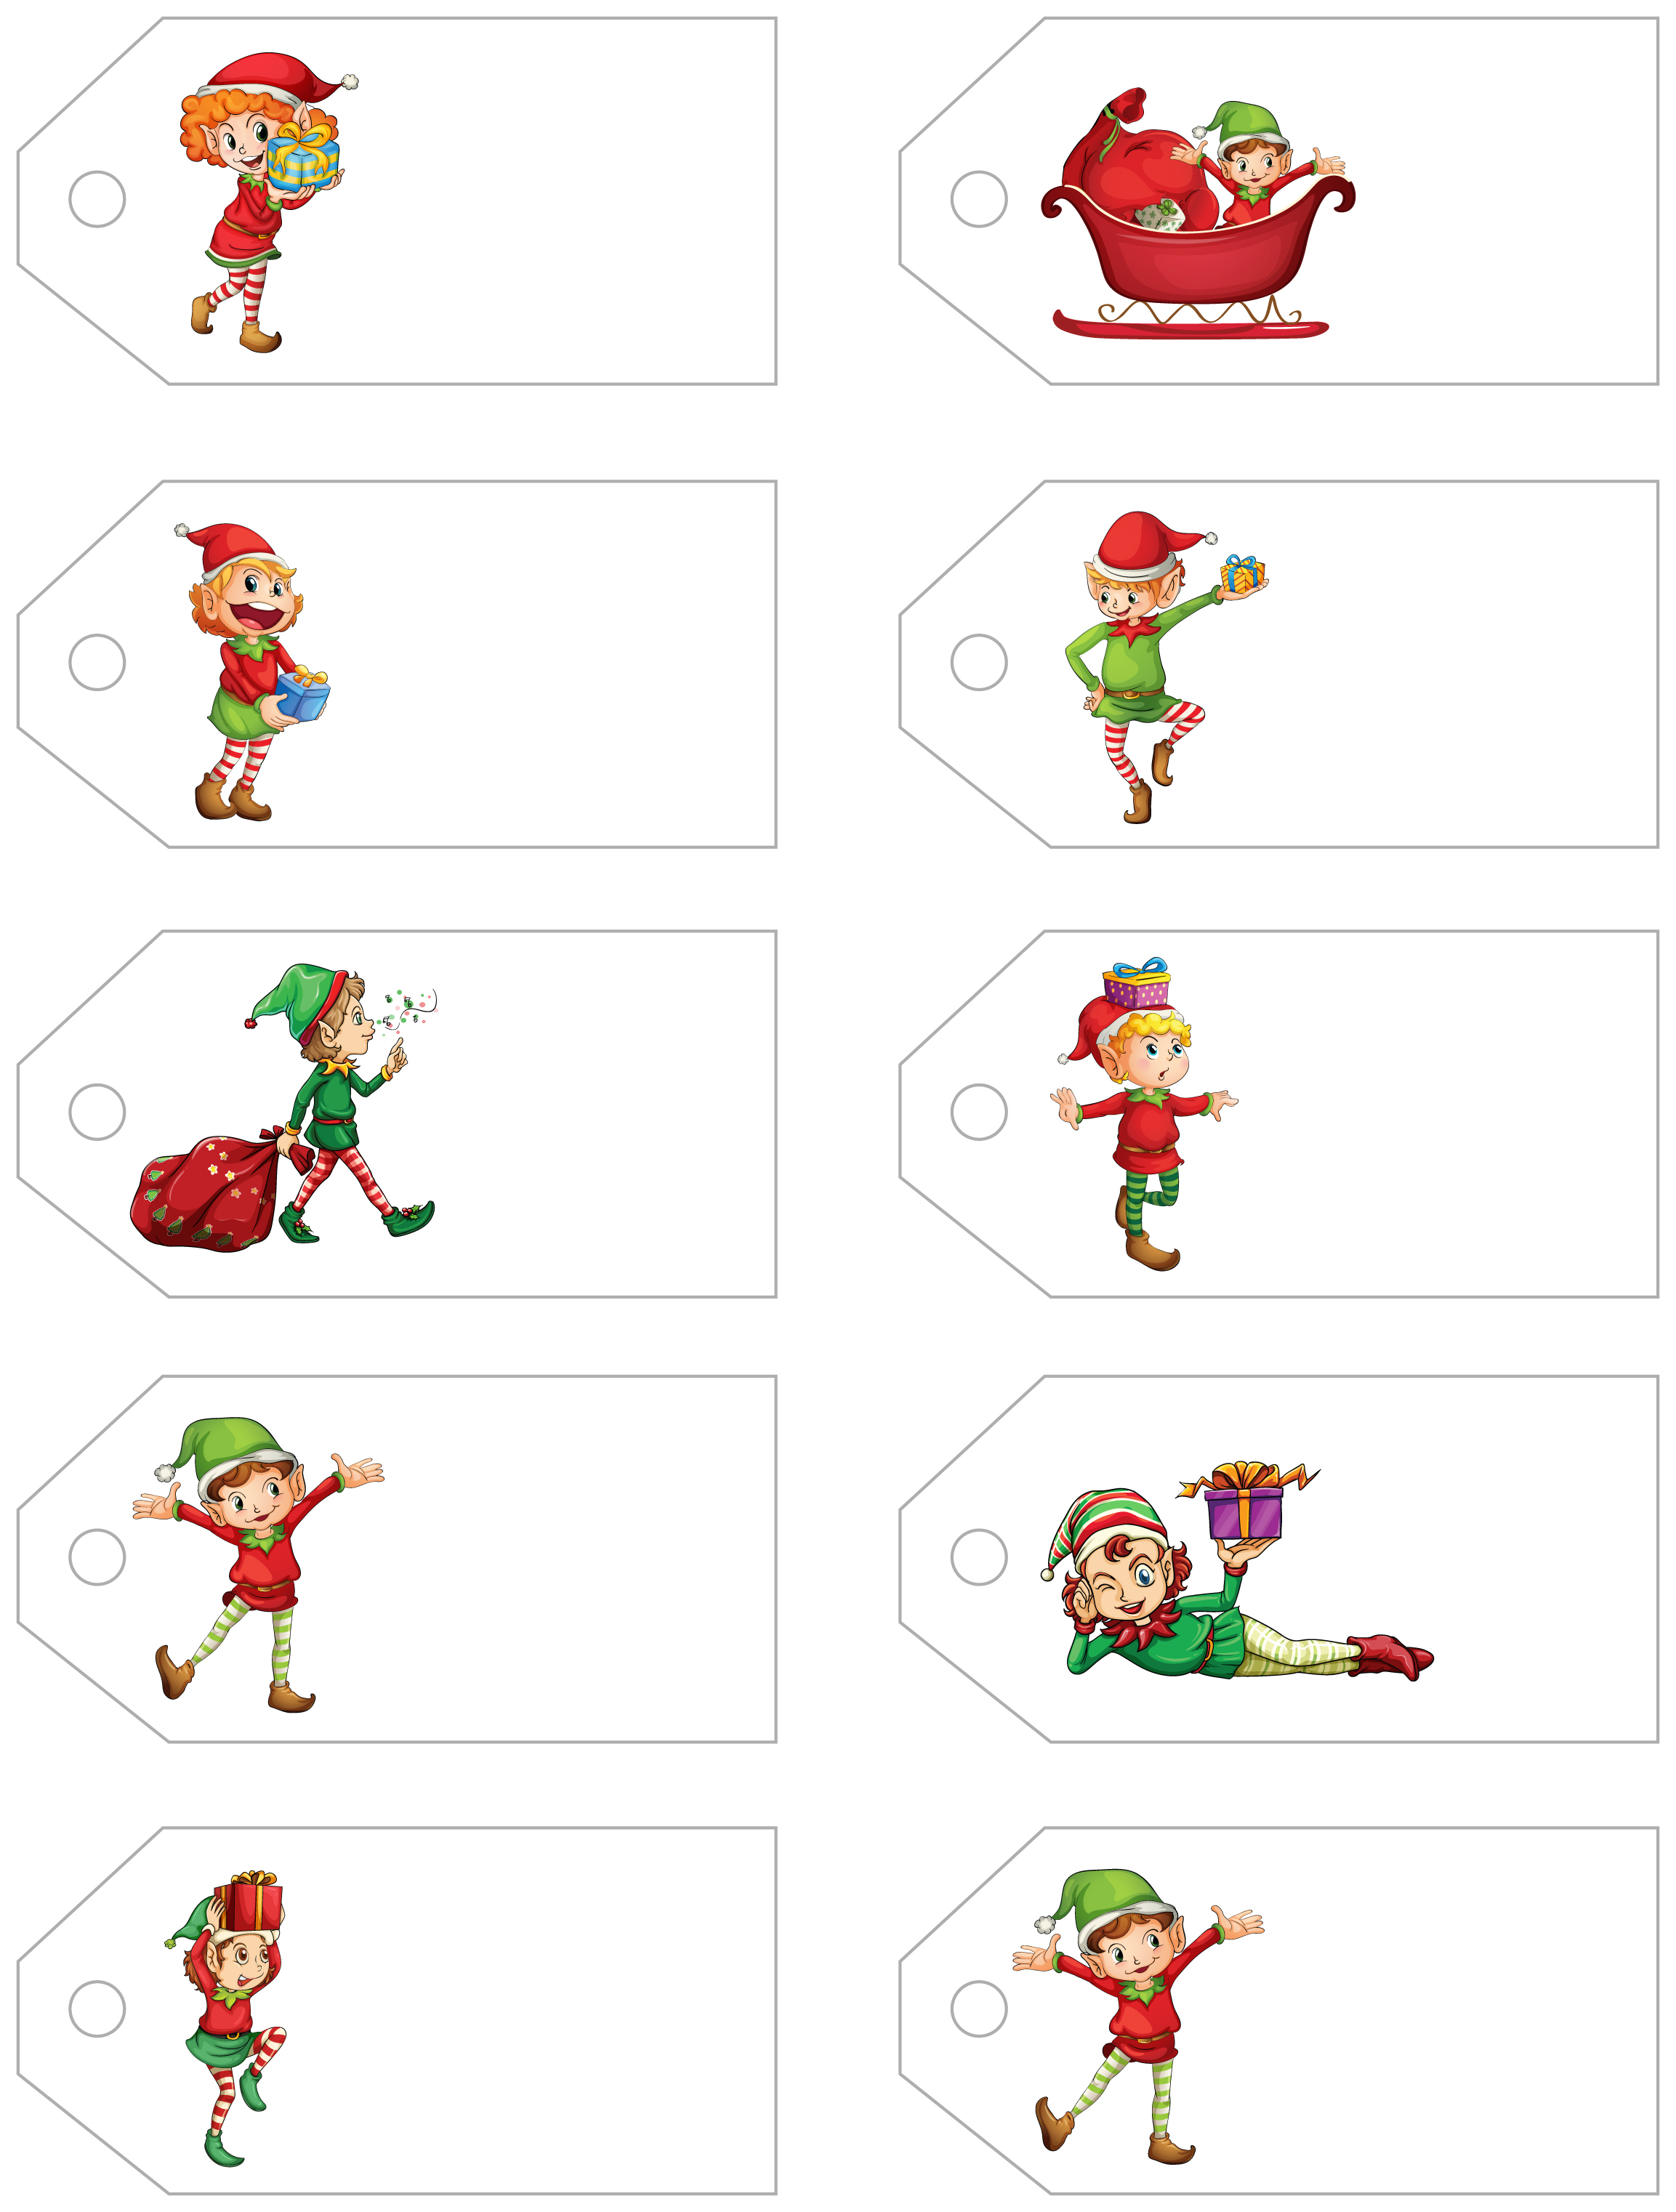 Santa's Little Gift To You! Free Printable Gift Tags And Labels - Free Printable Christmas Tags